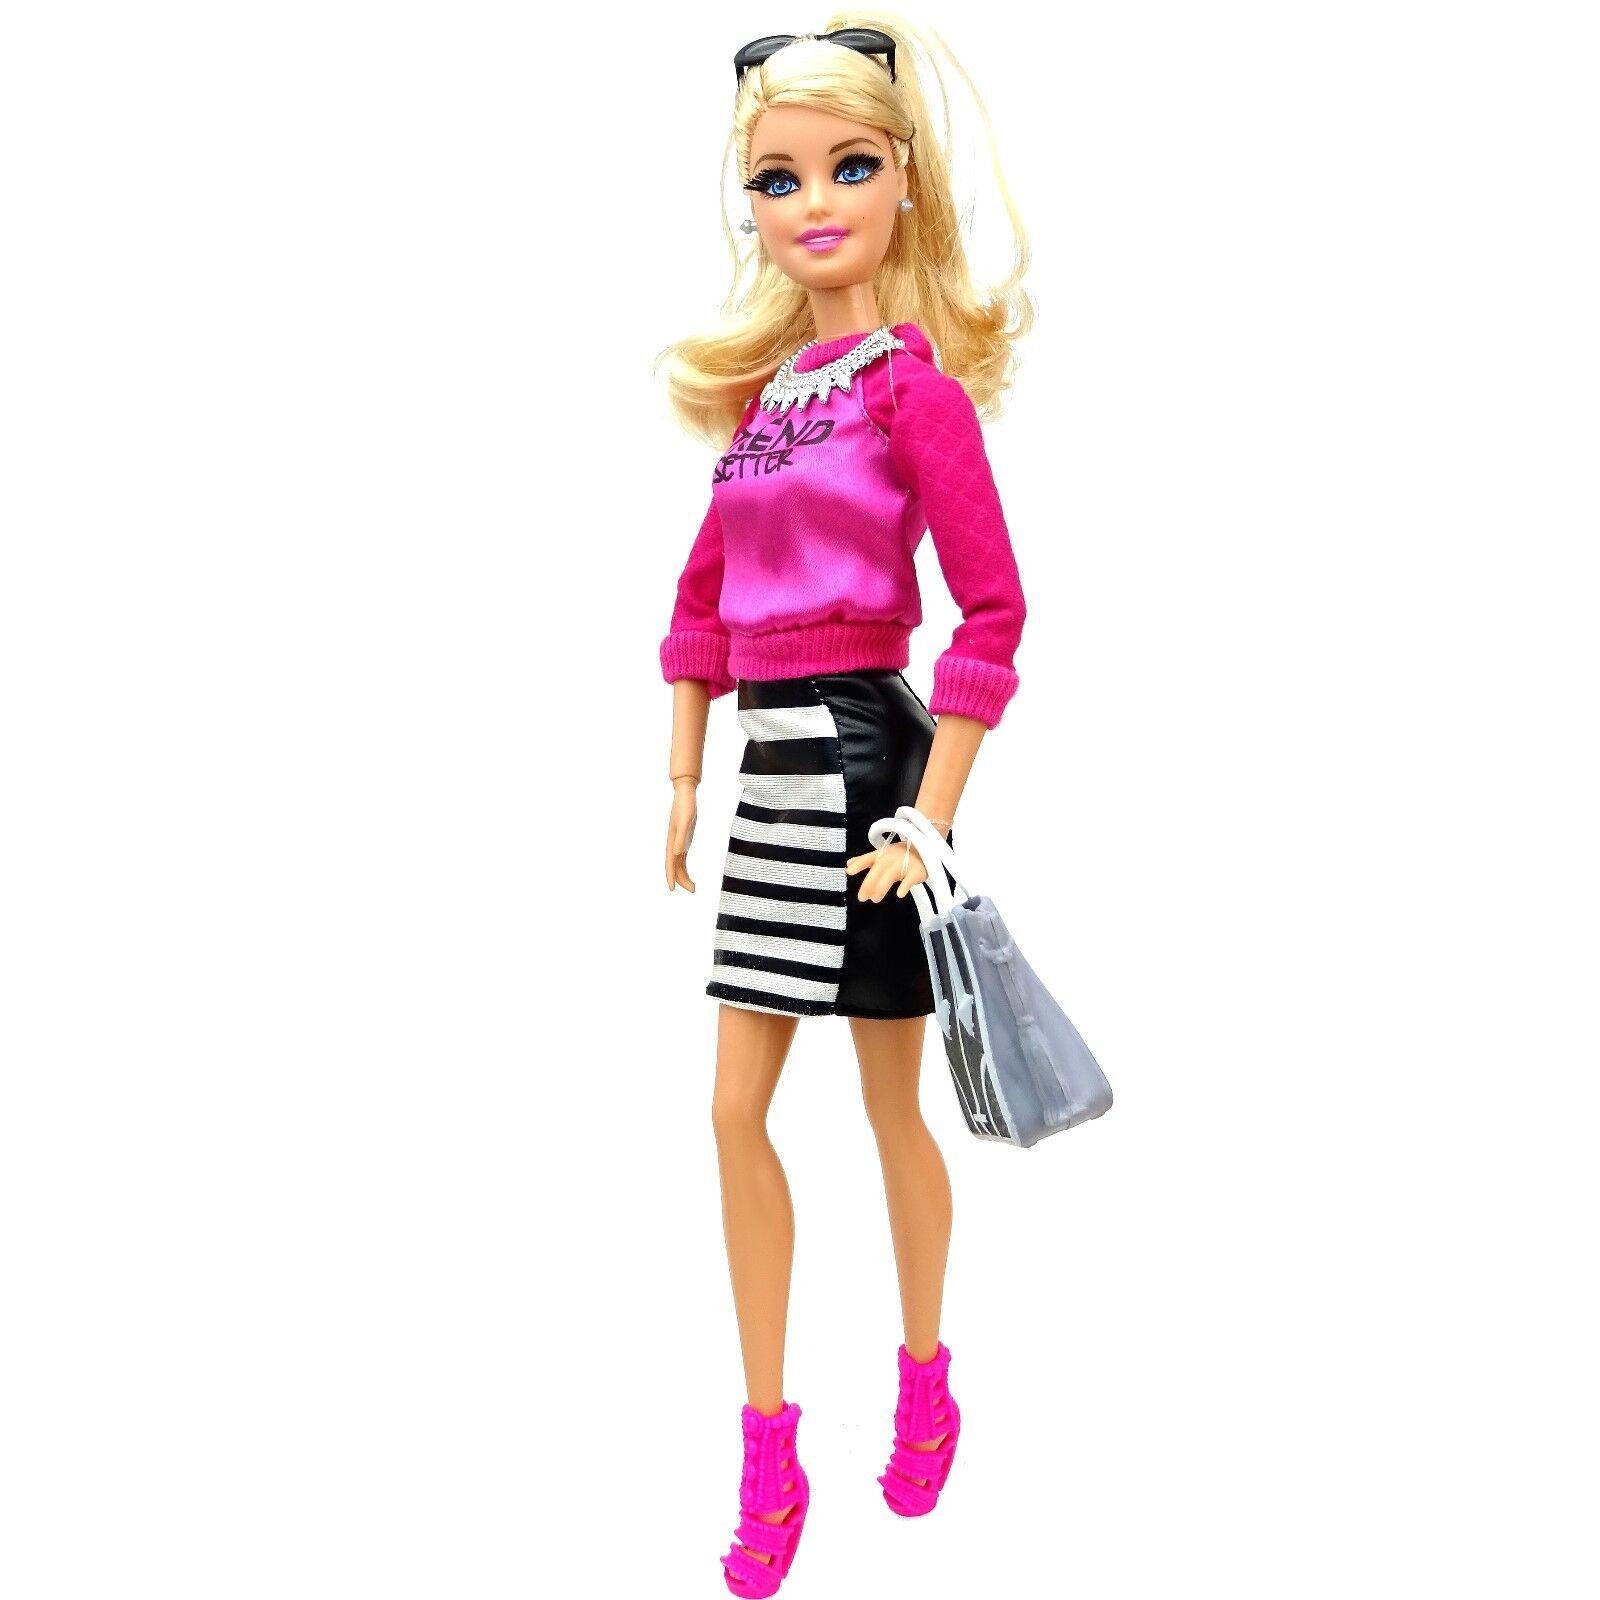 Barbie Barbie Barbie stile Styling amici Doll (B) trend-setter articolare Braccia Nuovo f7f72a